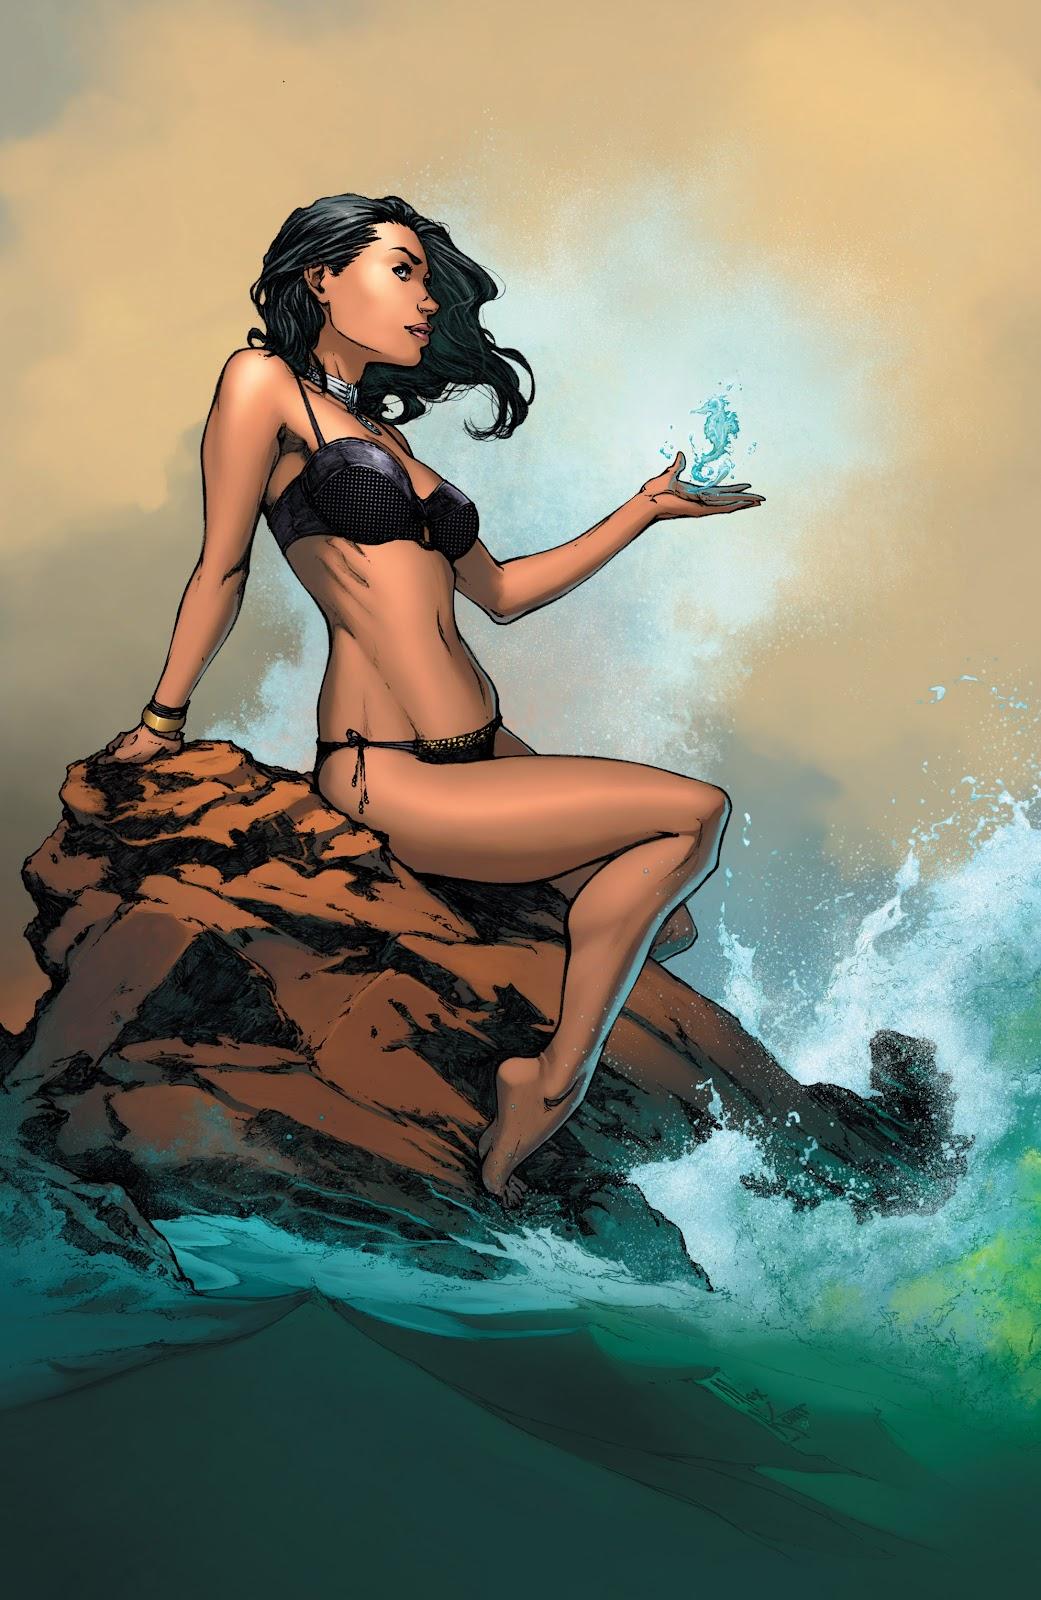 Read online Aspen Splash: Swimsuit Spectacular comic -  Issue # Issue 2013 - 3